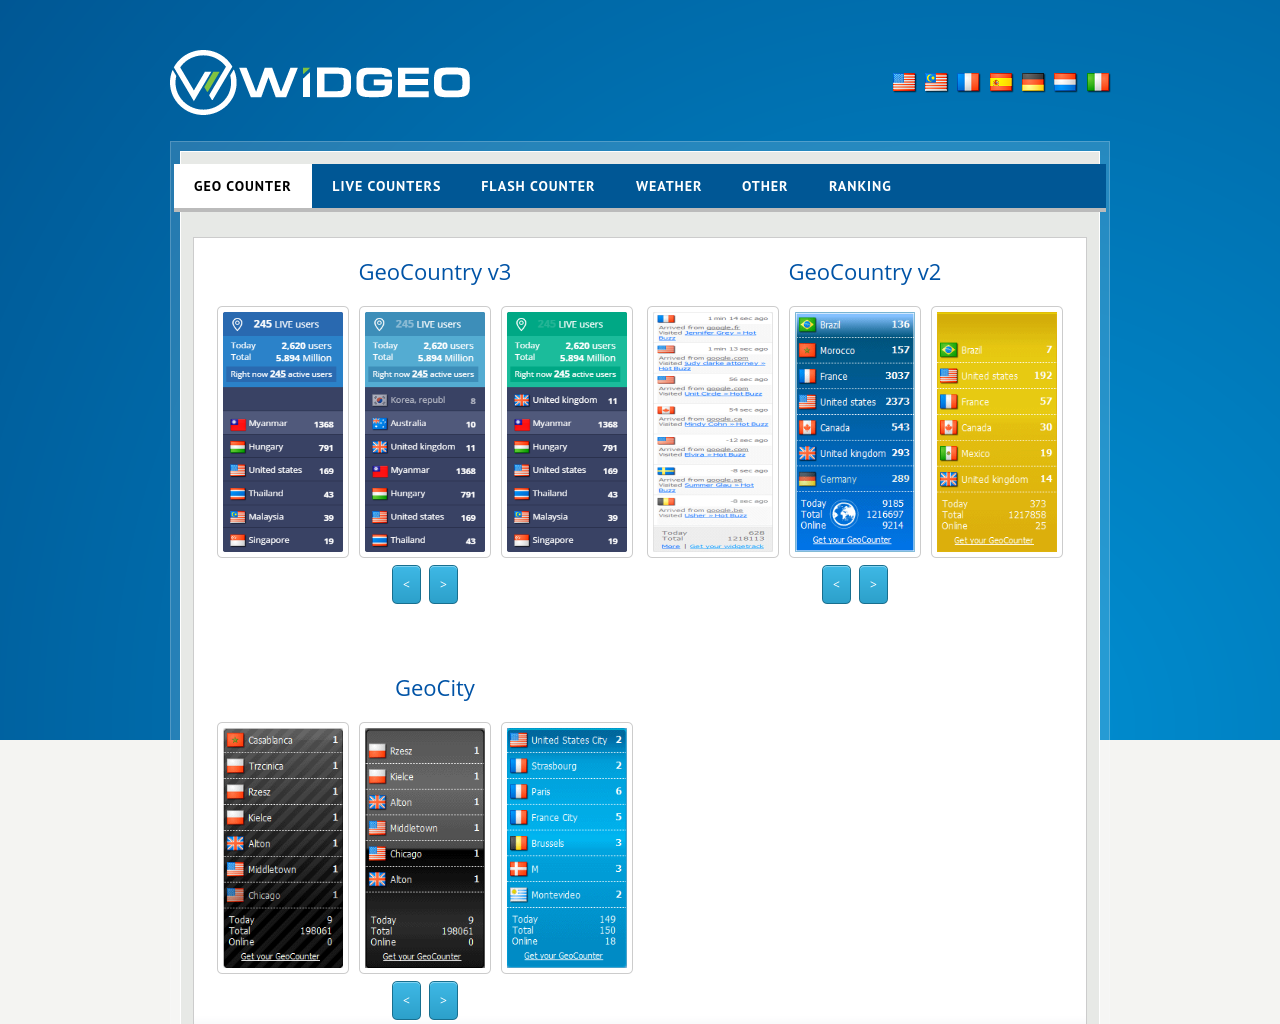 Widgeo-Advertising-Reviews-Pricing